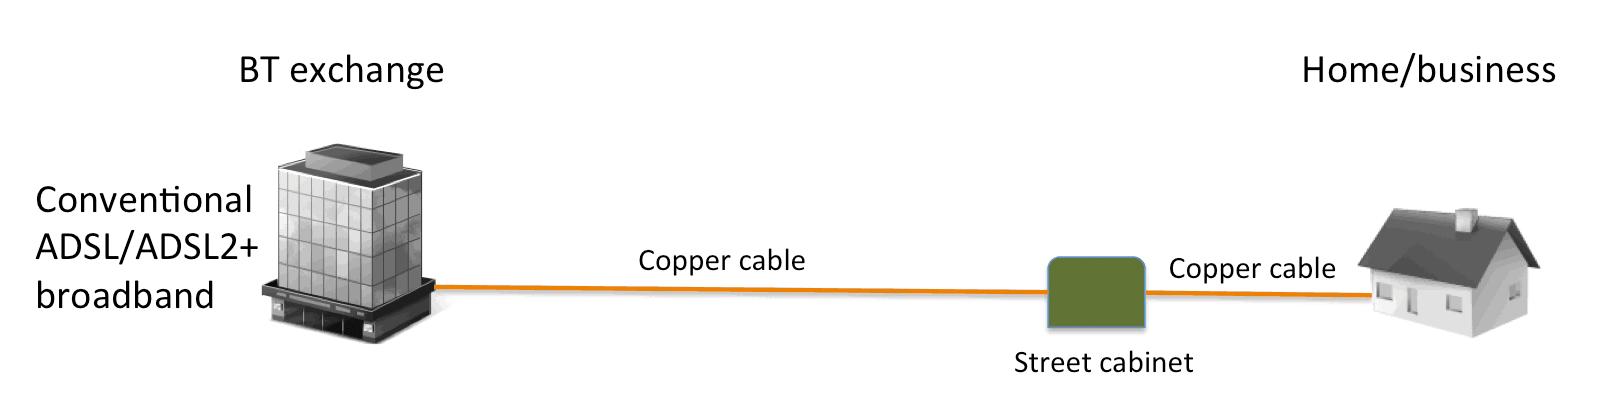 Conventional ADSL/ADSL2+ broadband